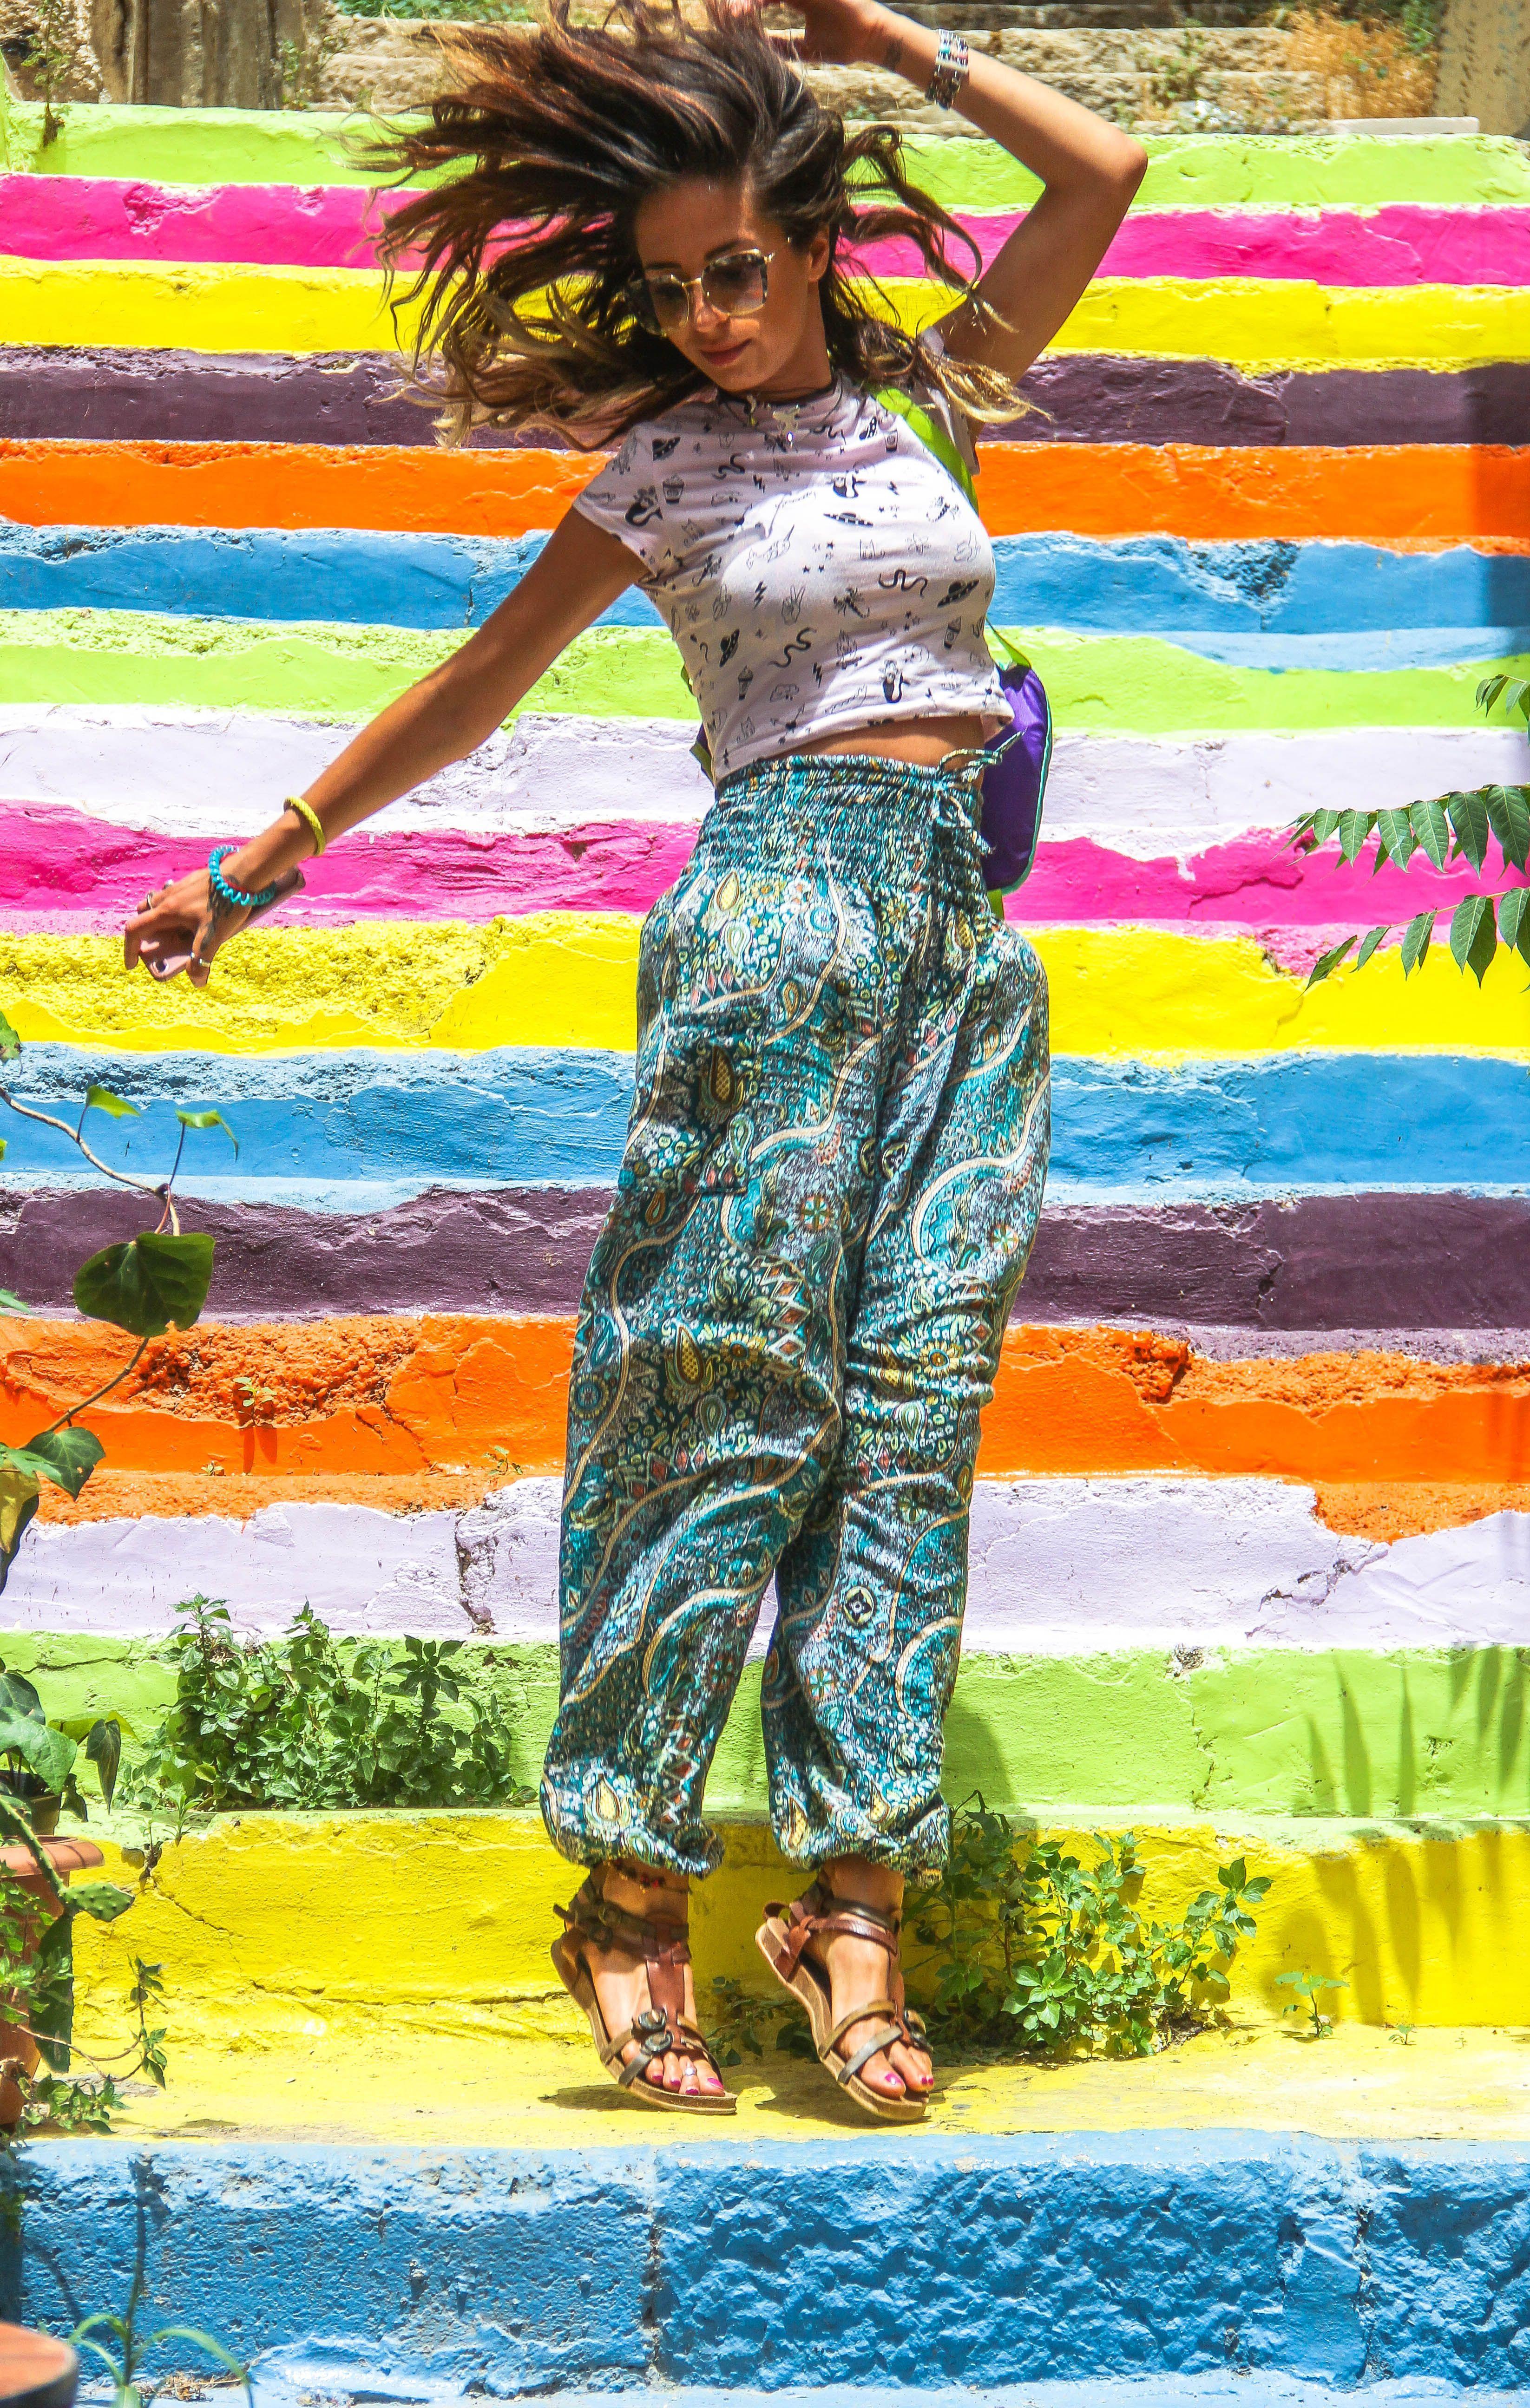 Amman Jordan #amman #jordan #middleeast #jump #colorful #stairs #happy #happyvibes #aroundtheglobe #wanderlust #traveltheworld #quityourjob #justbackfrom #mytinyatlas #girlaroundworld #exploring #inlove #girlthatwander #keepitwild #beautifuldestinations #pursuitofbliss #travelmore #ammanjordan Amman Jordan #amman #jordan #middleeast #jump #colorful #stairs #happy #happyvibes #aroundtheglobe #wanderlust #traveltheworld #quityourjob #justbackfrom #mytinyatlas #girlaroundworld #exploring #inlove #g #ammanjordan